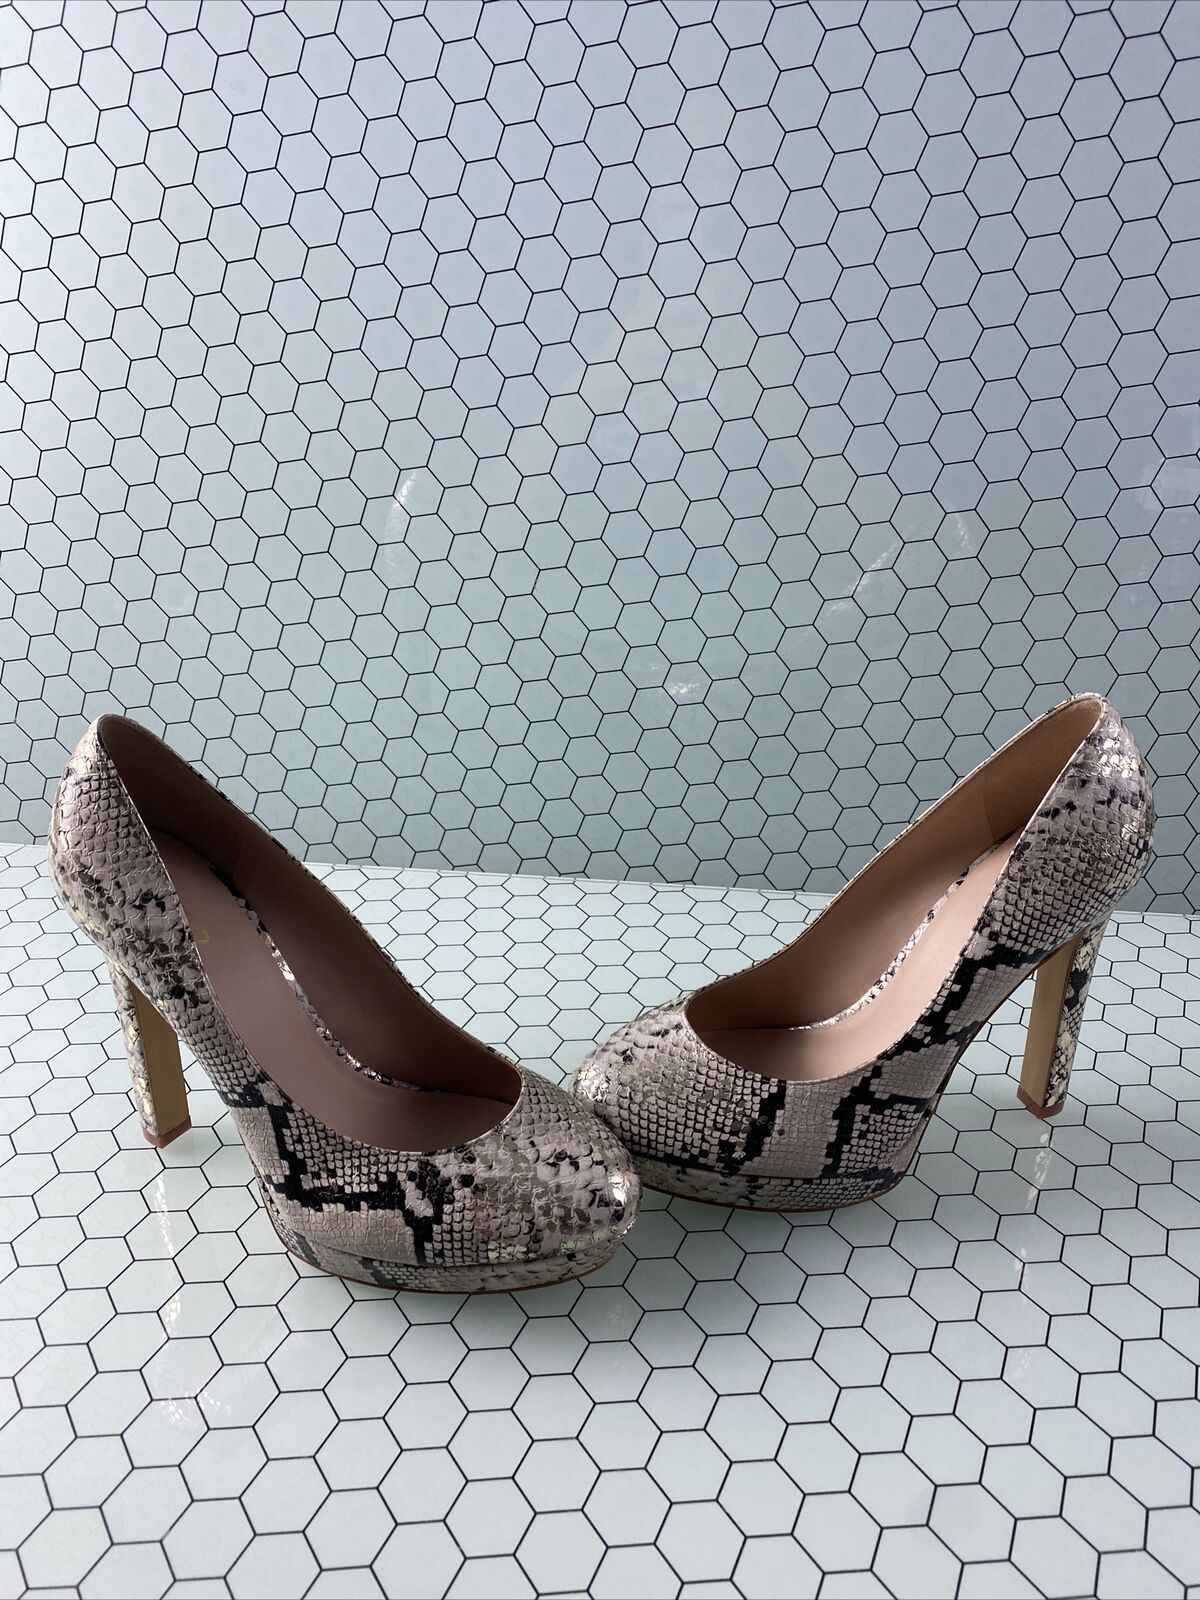 ALDO Metallic Snake Print Leather Round Toe Slip On High Heels Women's Size 9